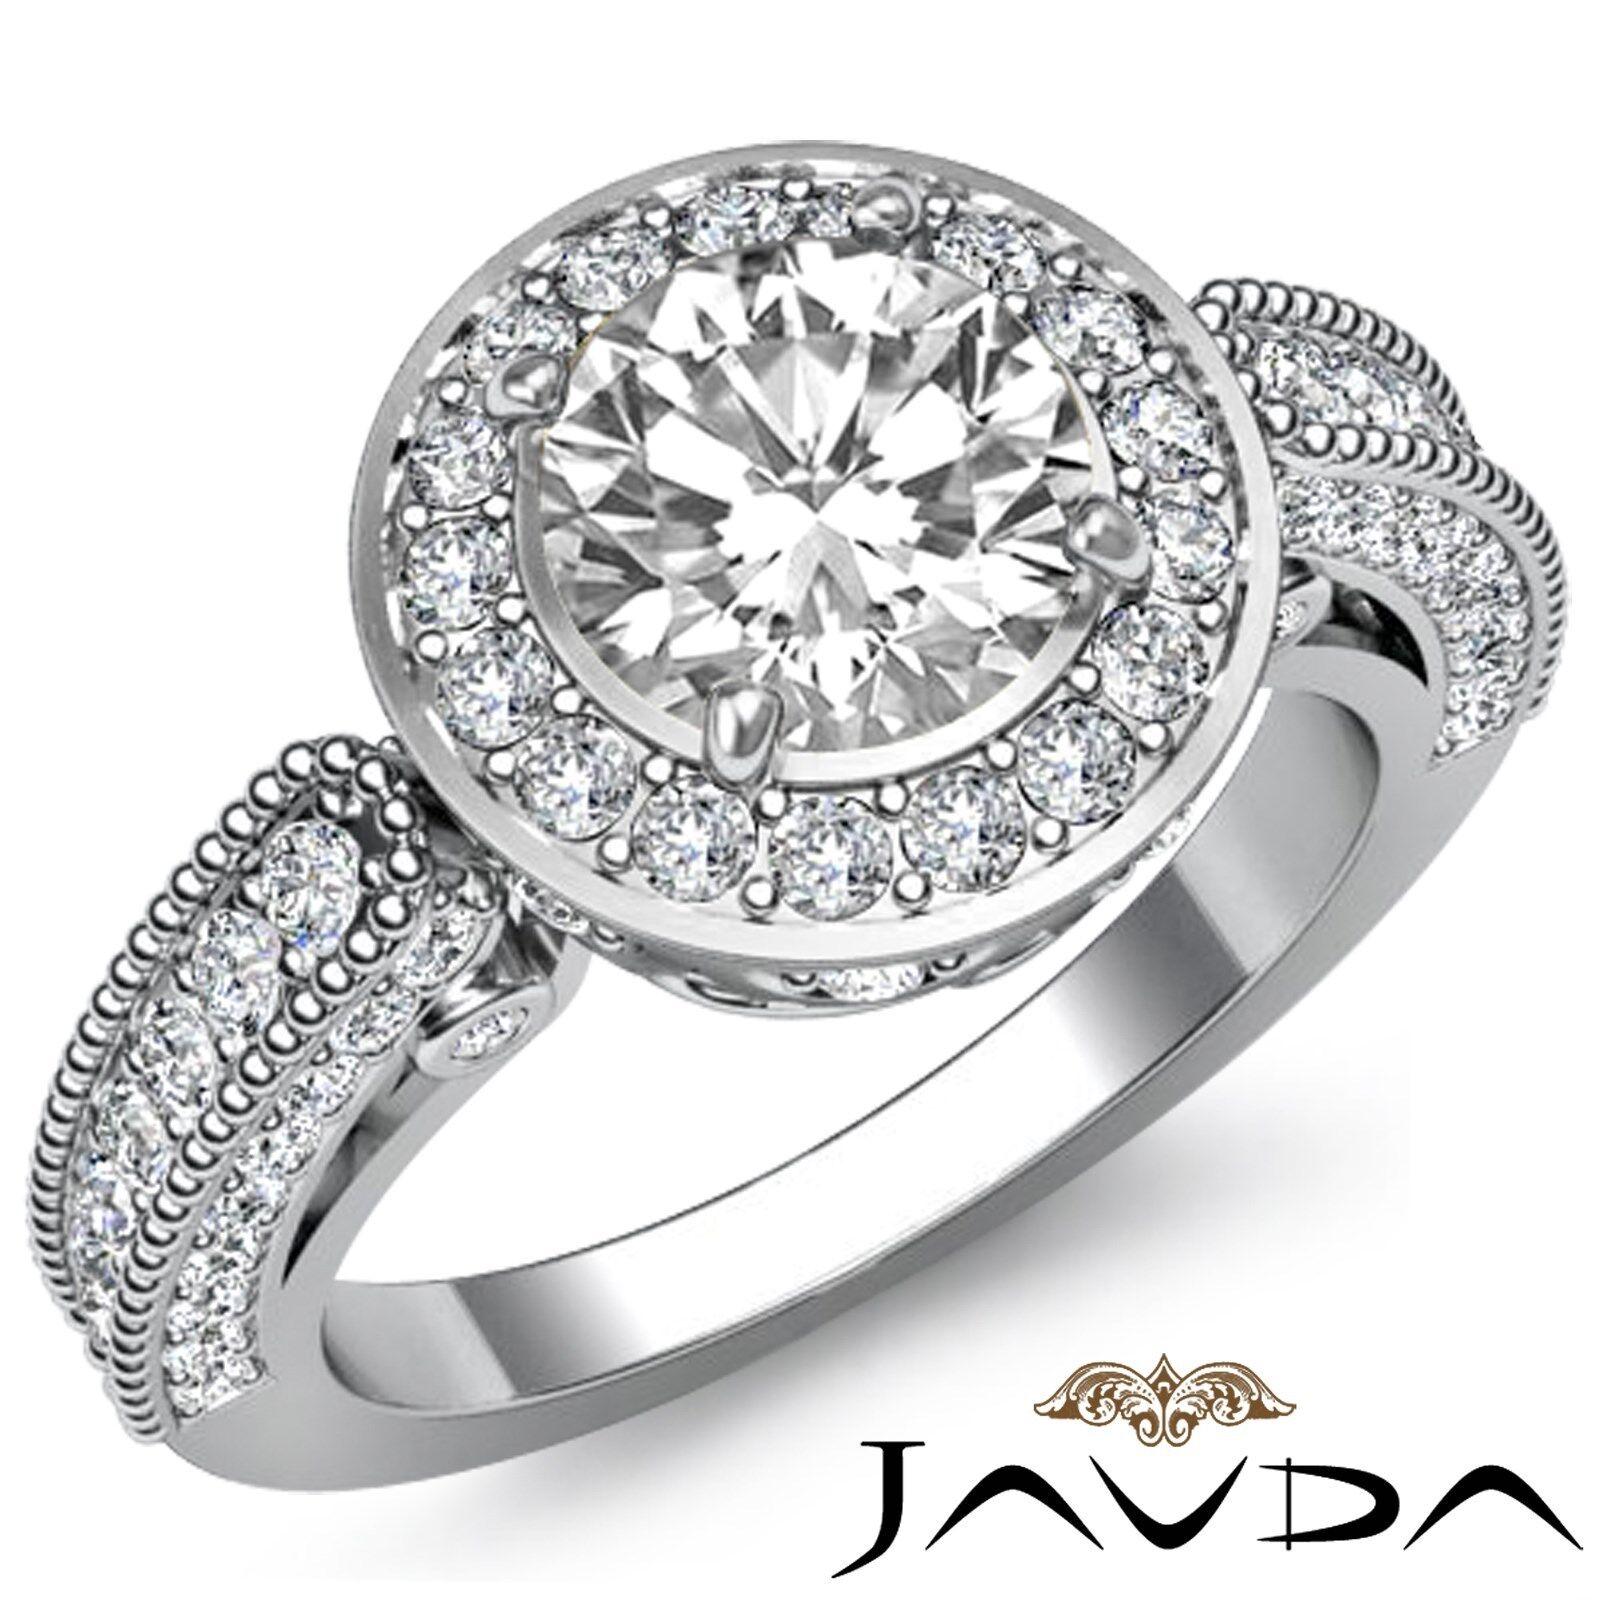 Halo Filigree Design Pave Round Diamond Engagement Milgrain Ring GIA F VS1 2.5Ct